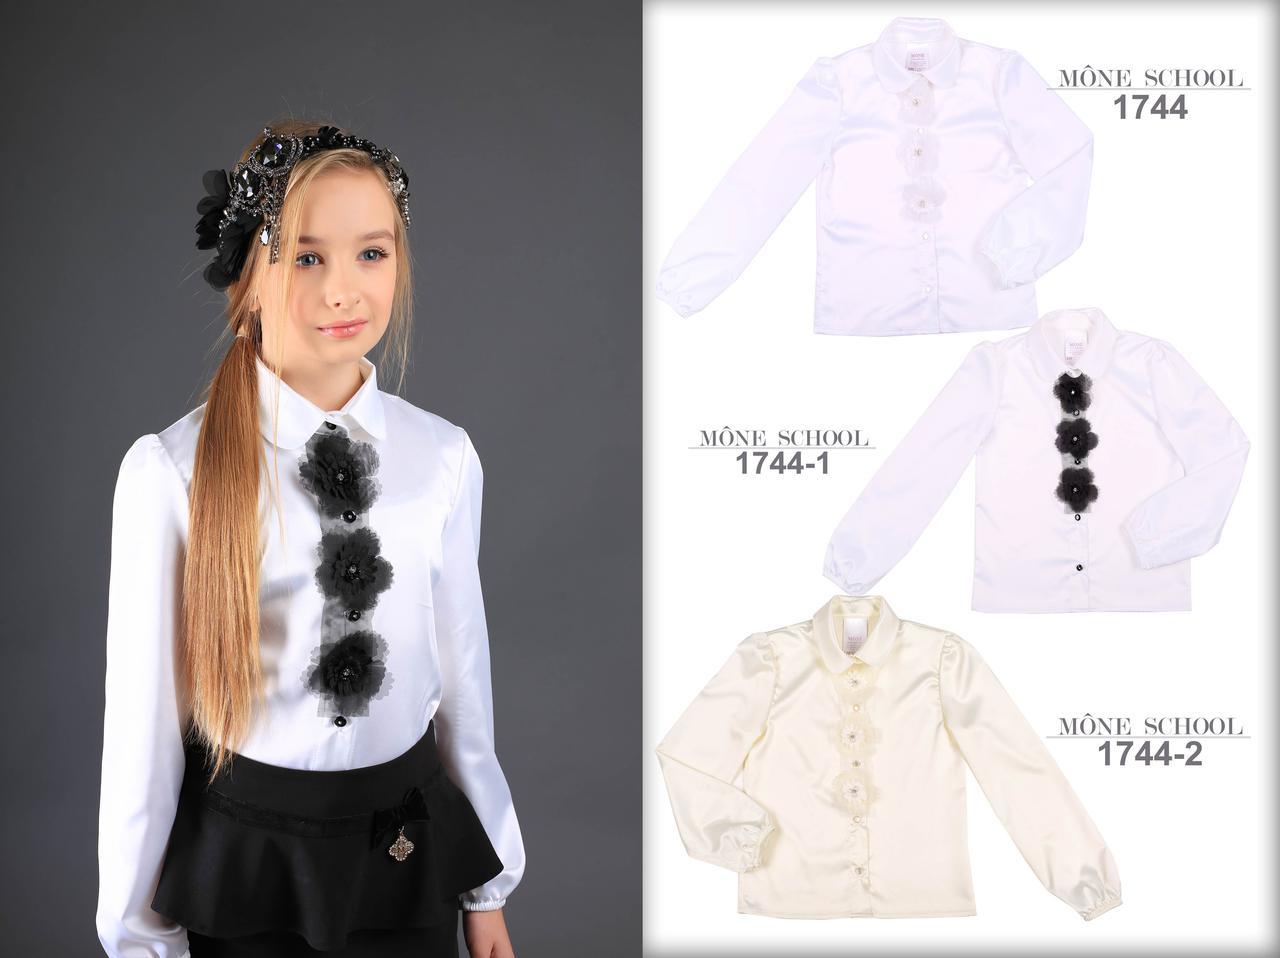 dba7d41df1d Школьная атласная блузка (молочная) MONE р-р 140 - Интернет-магазин Мамины